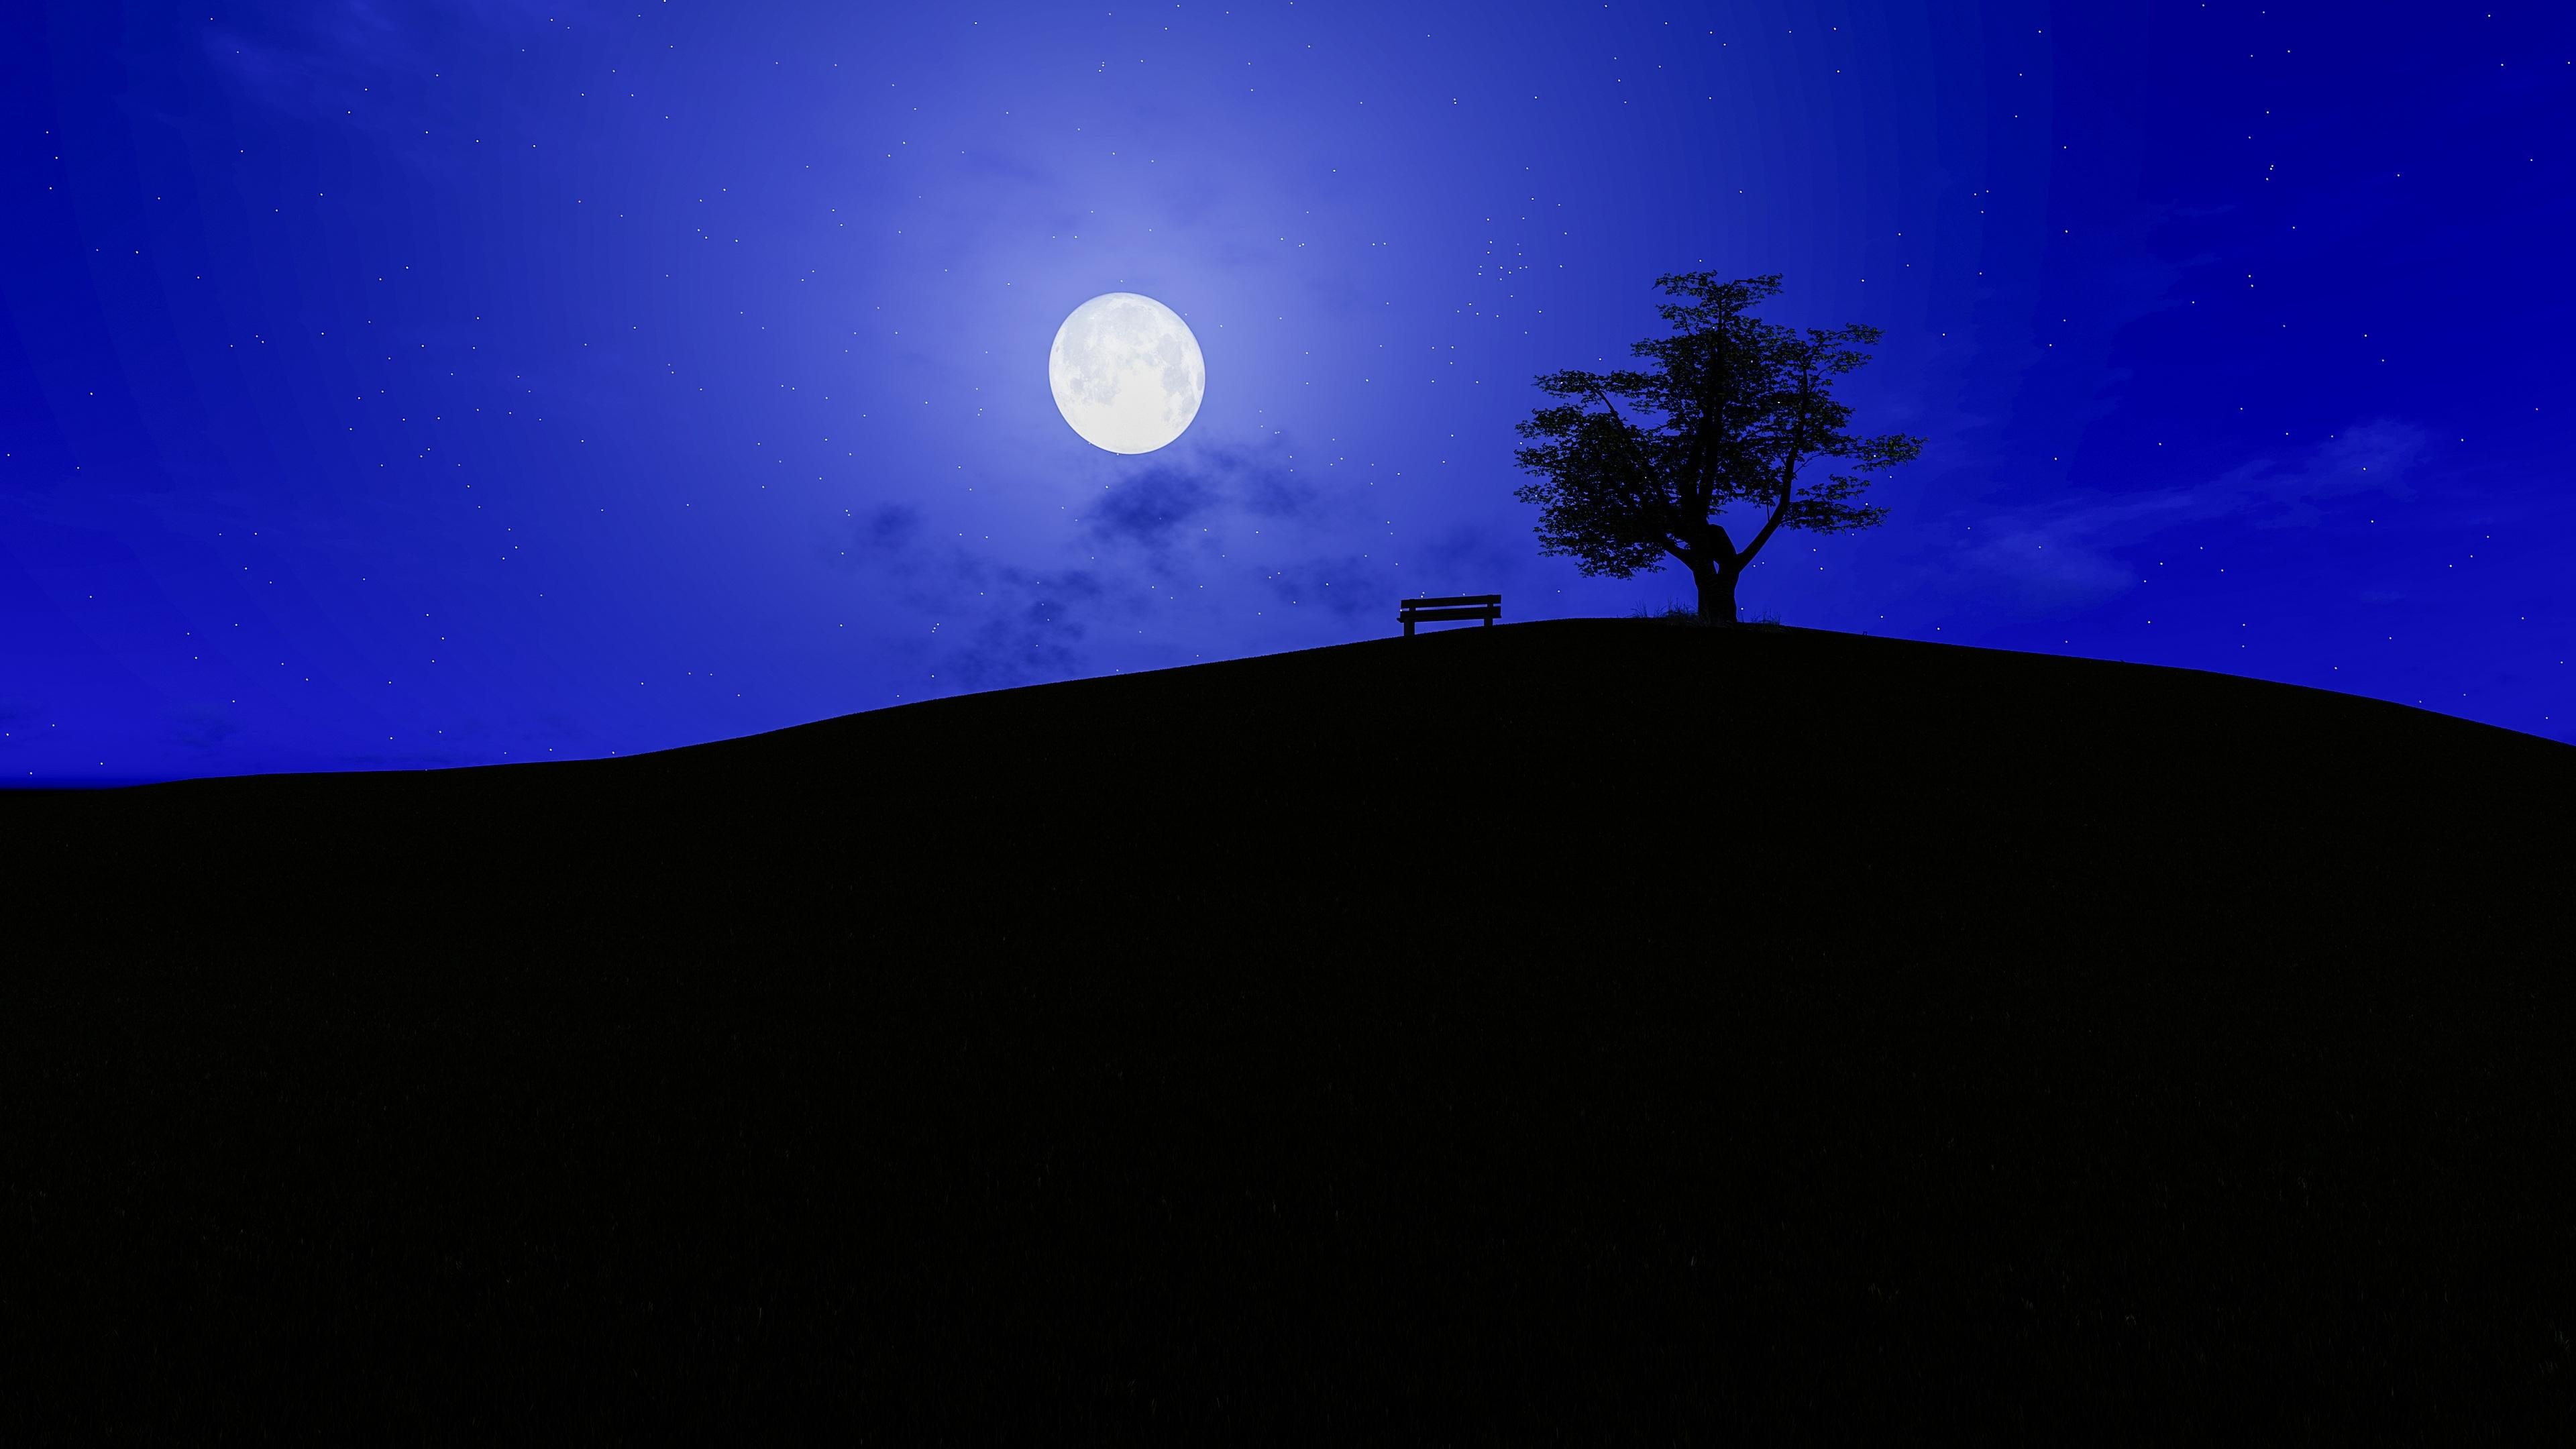 Сияние луны на звездном небосводе отражает силуэт дерева на холме